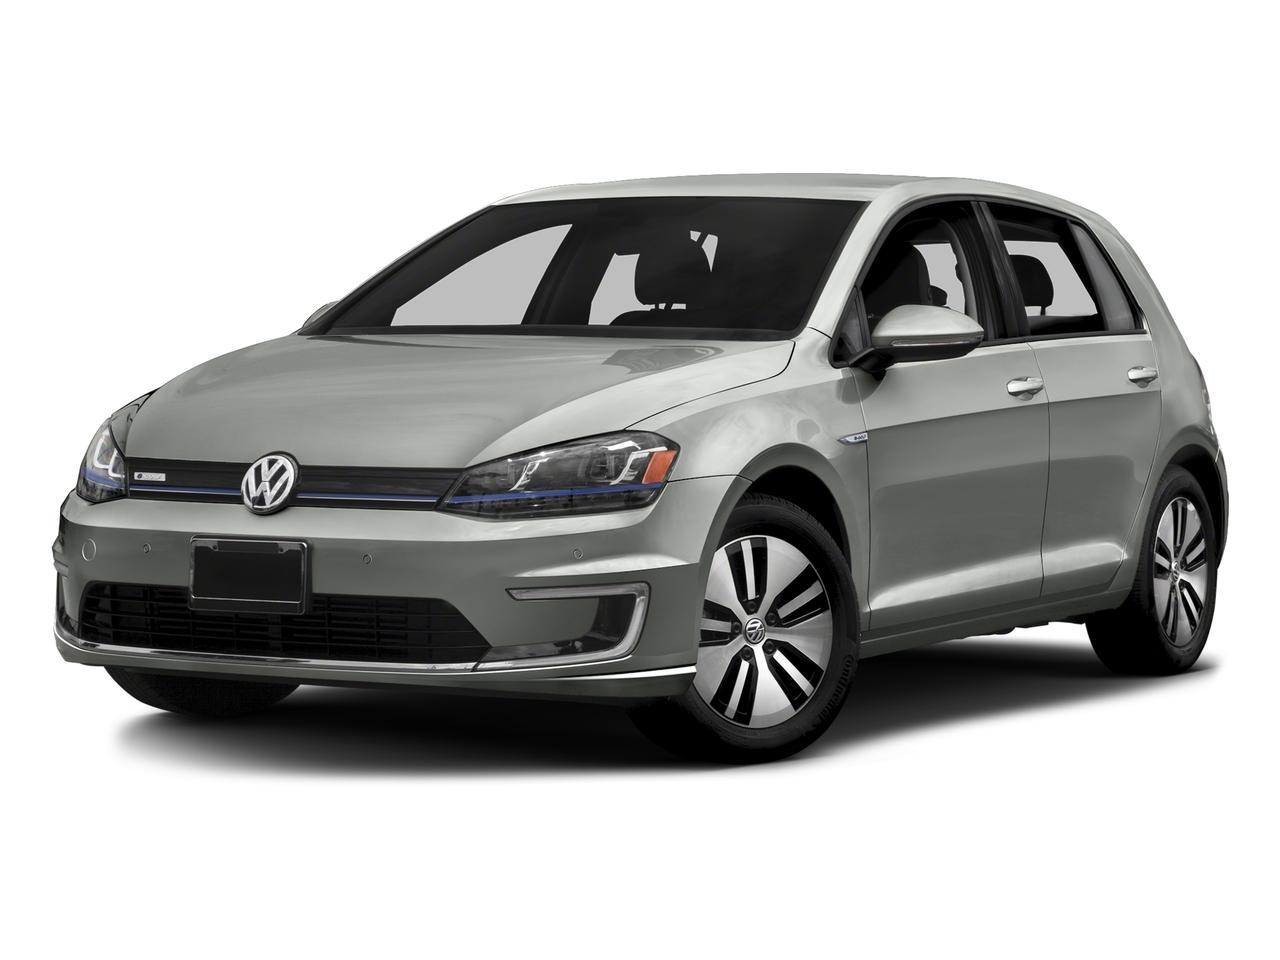 2015 Volkswagen e-Golf Vehicle Photo in Colorado Springs, CO 80905